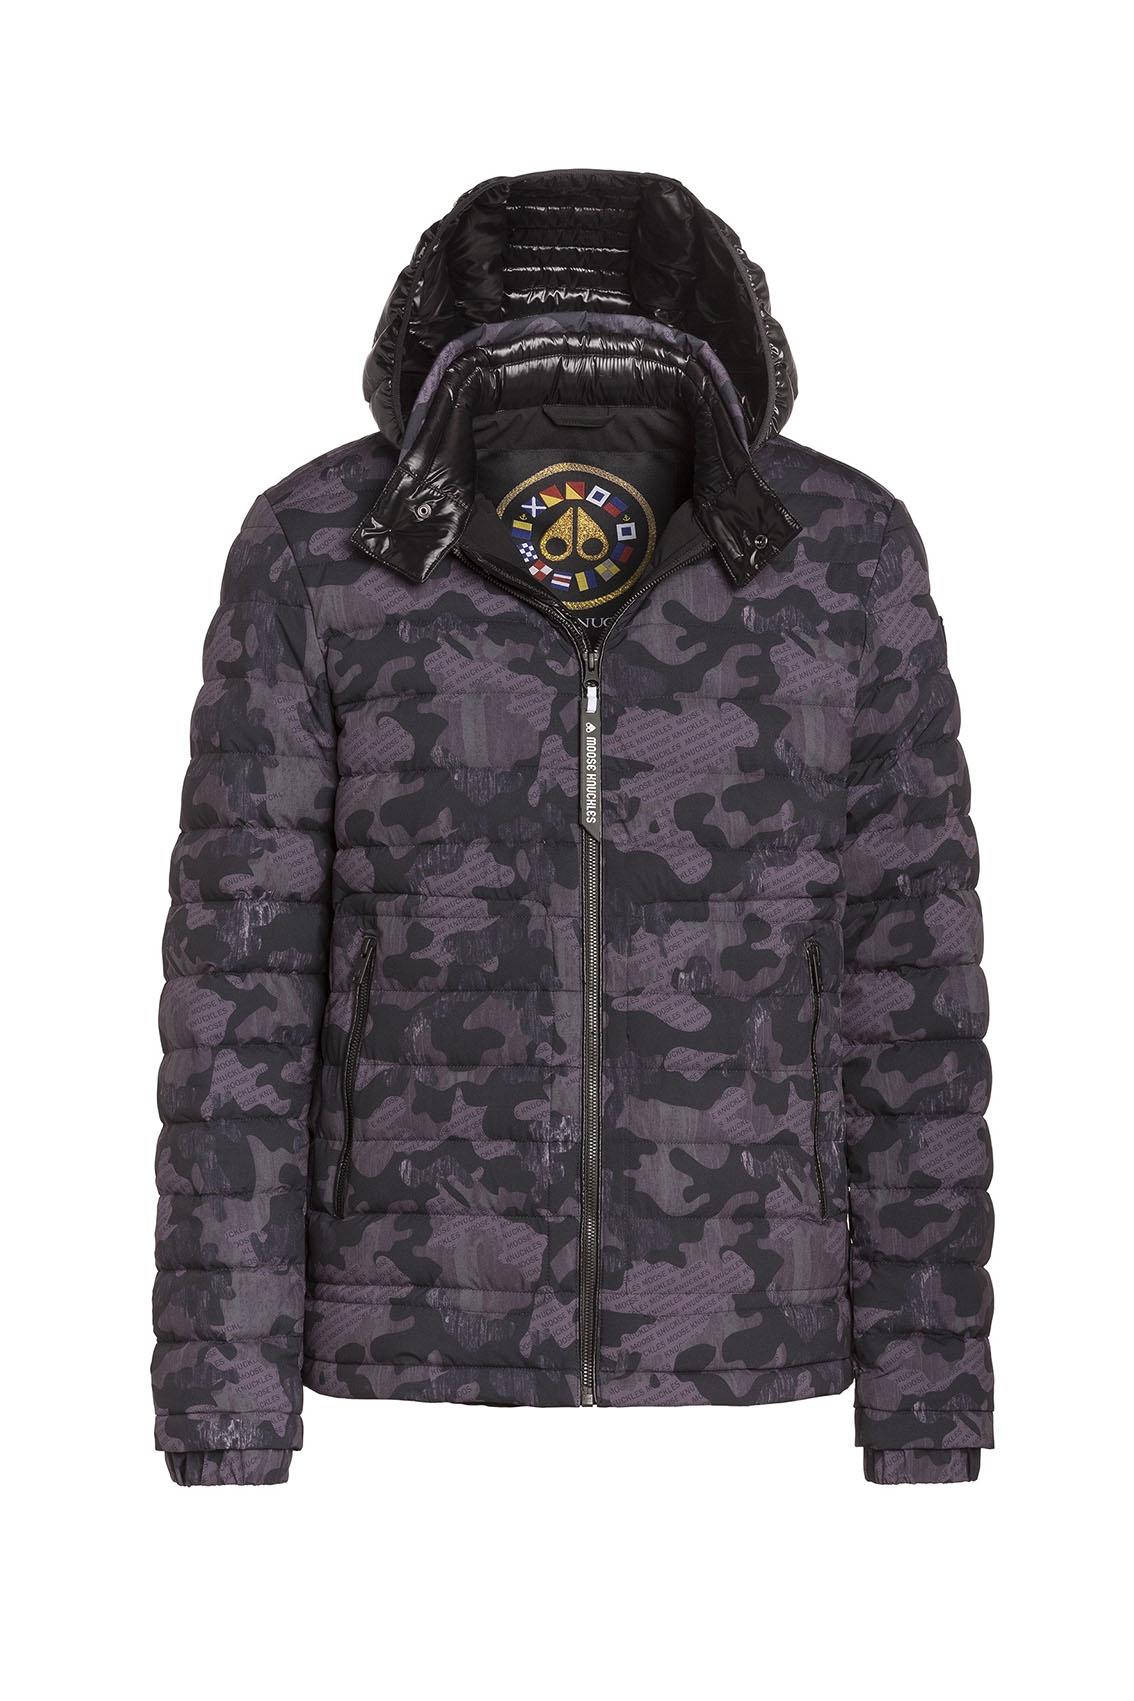 moose-knuckles_romieu-jacket6